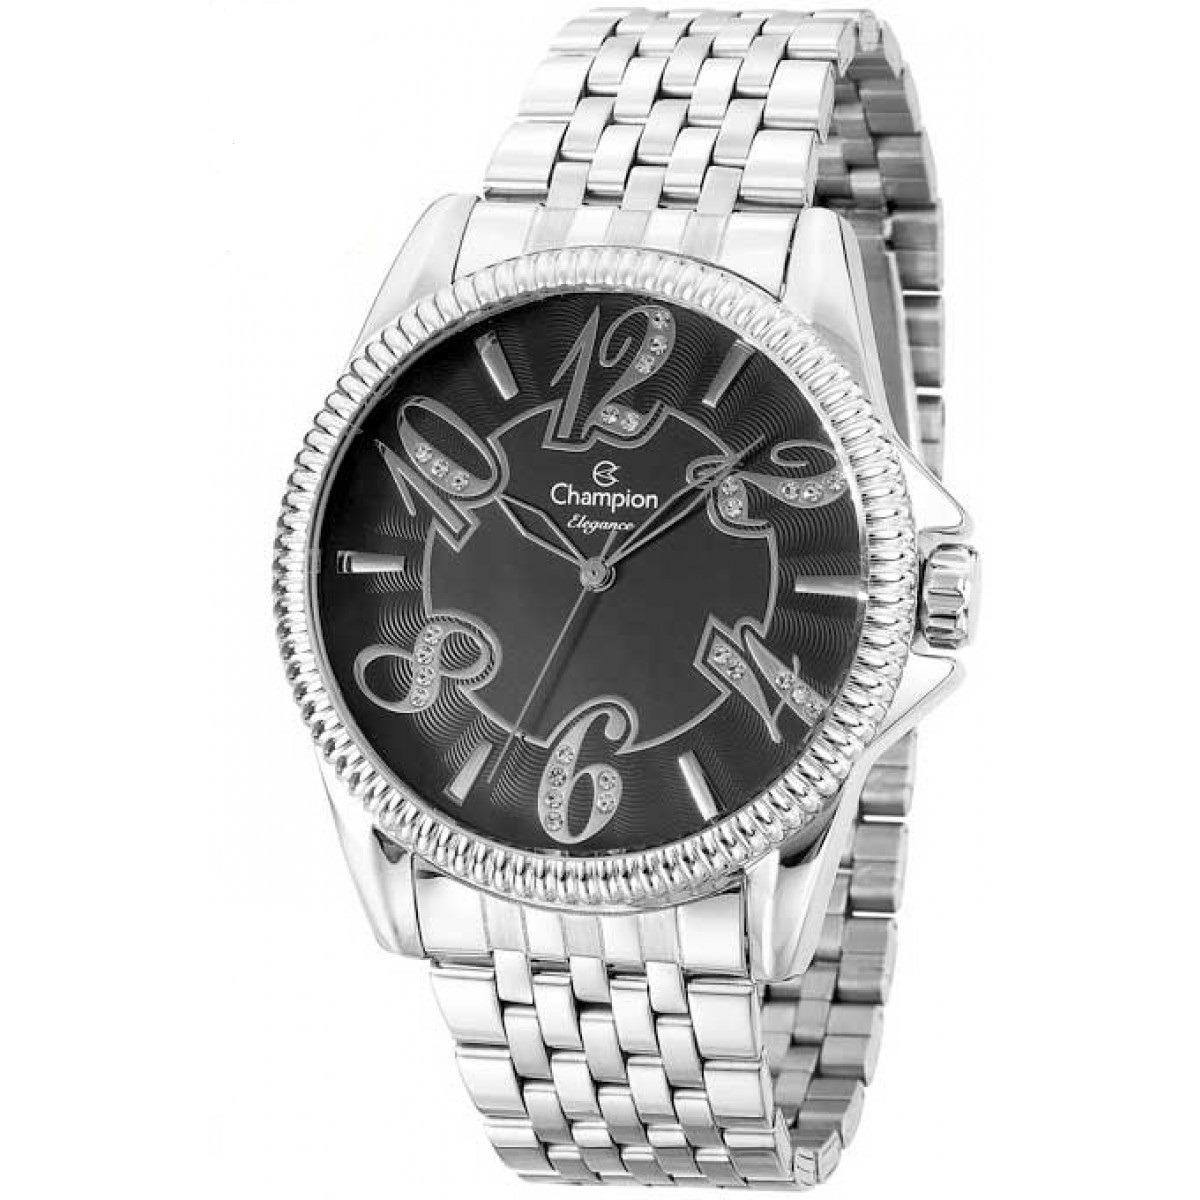 2436c1ab8e1 kit relógio champion feminino prata social barato cn27358d. Carregando zoom.